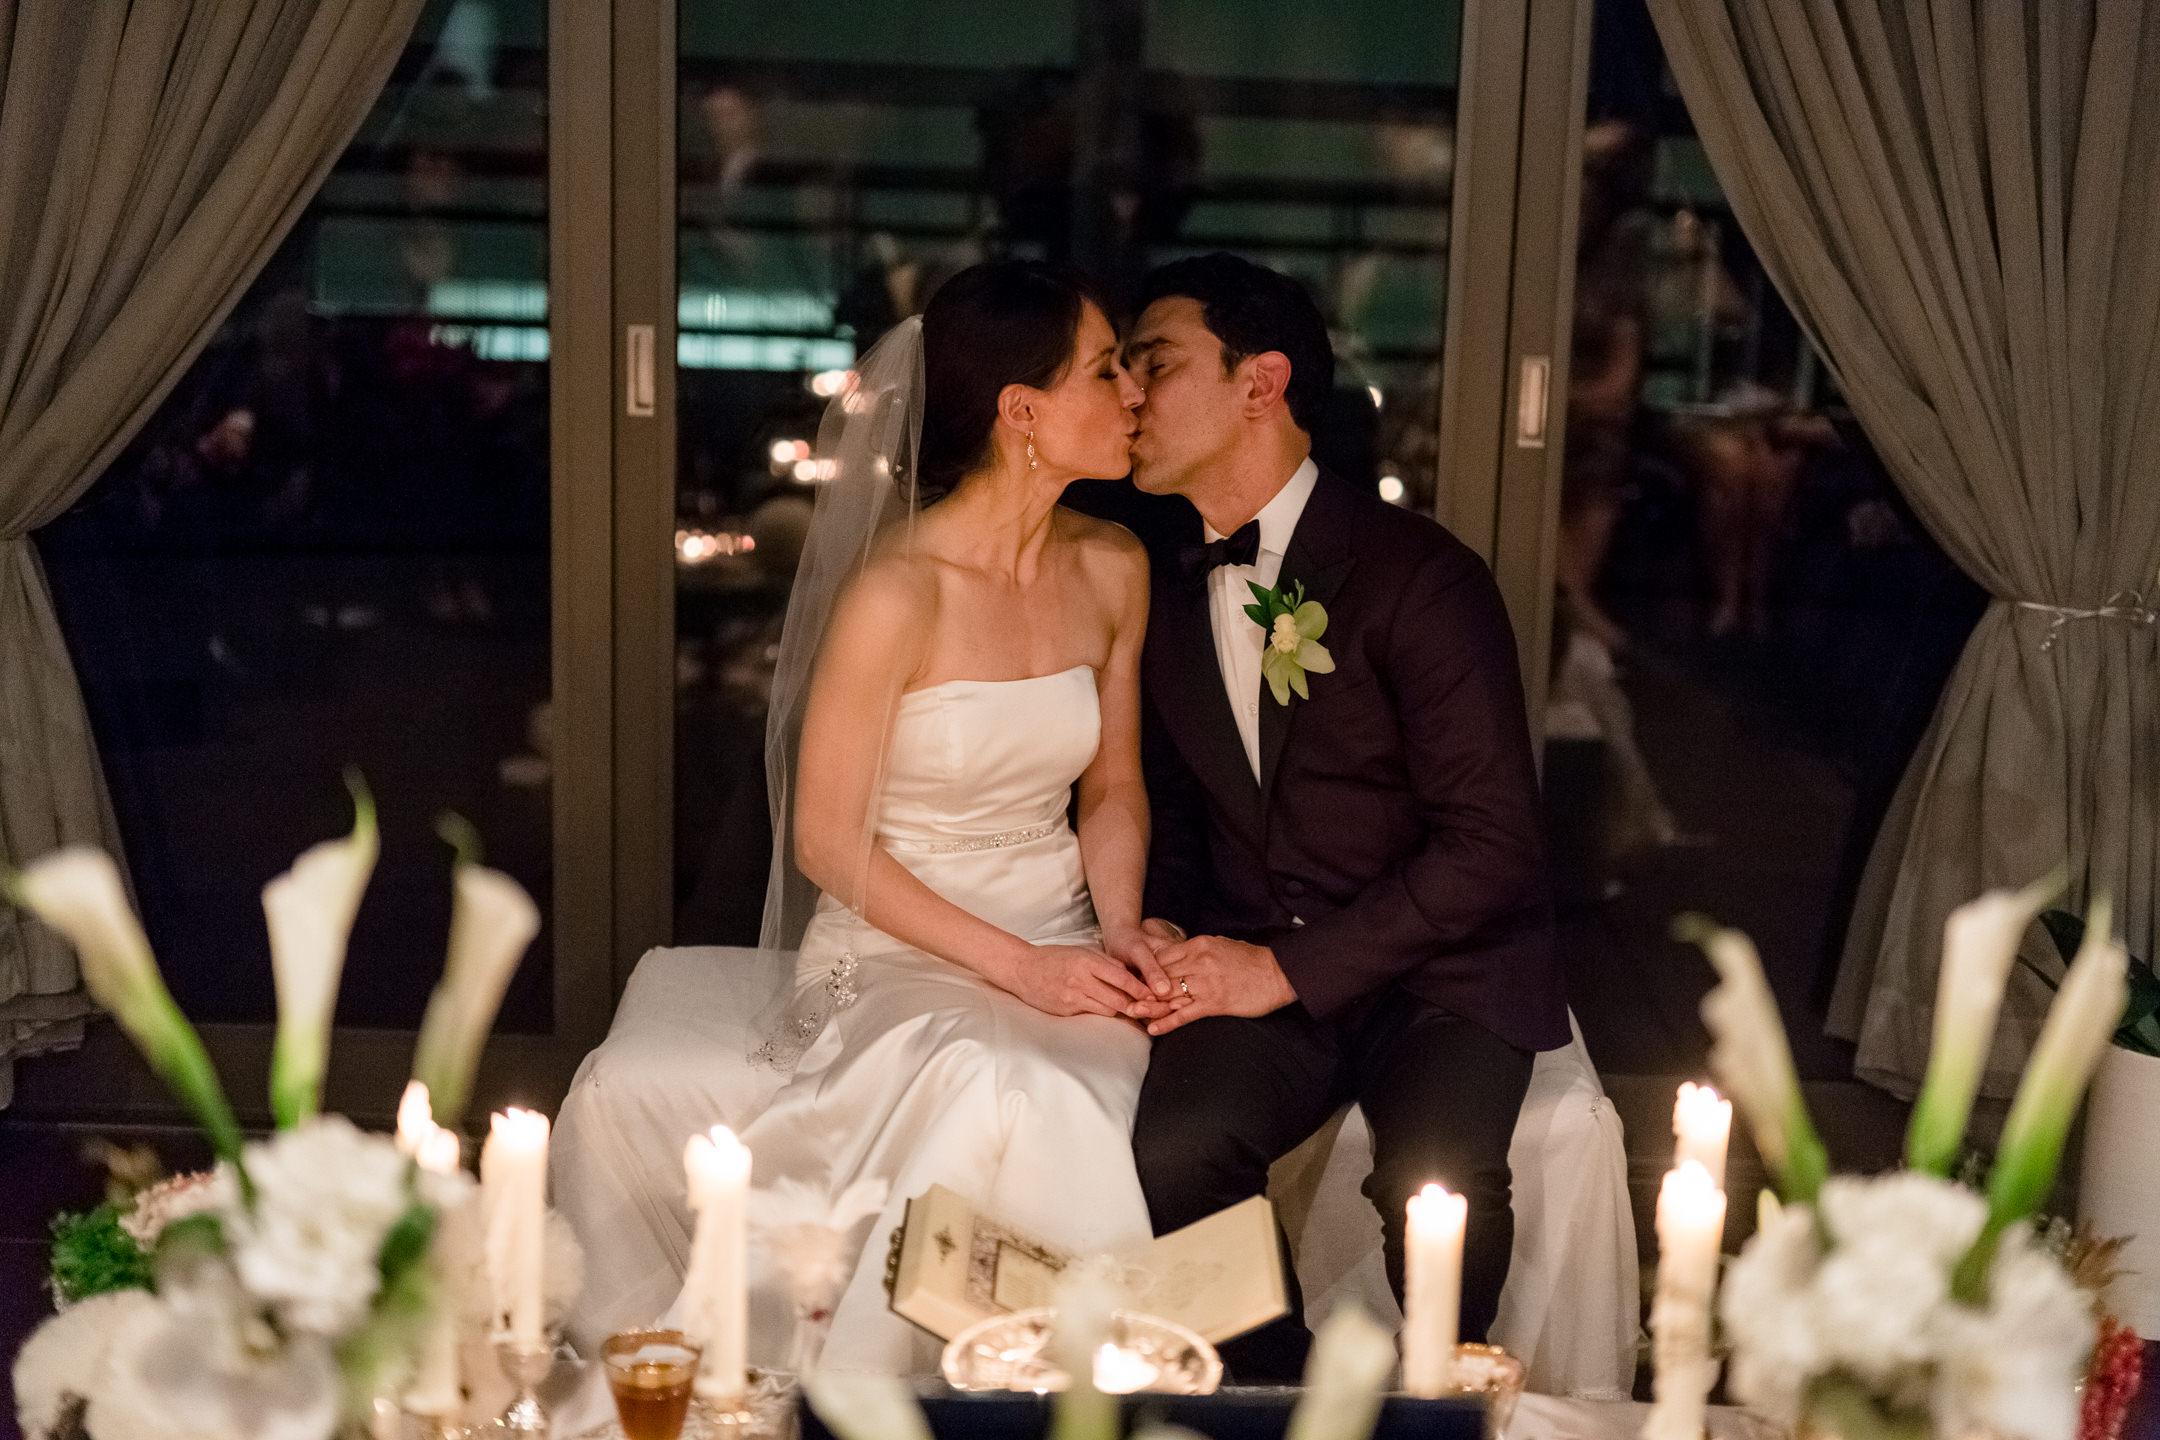 Documentary-Wedding-Photography-Andrew-Tat-Maria & AJ-22.jpg